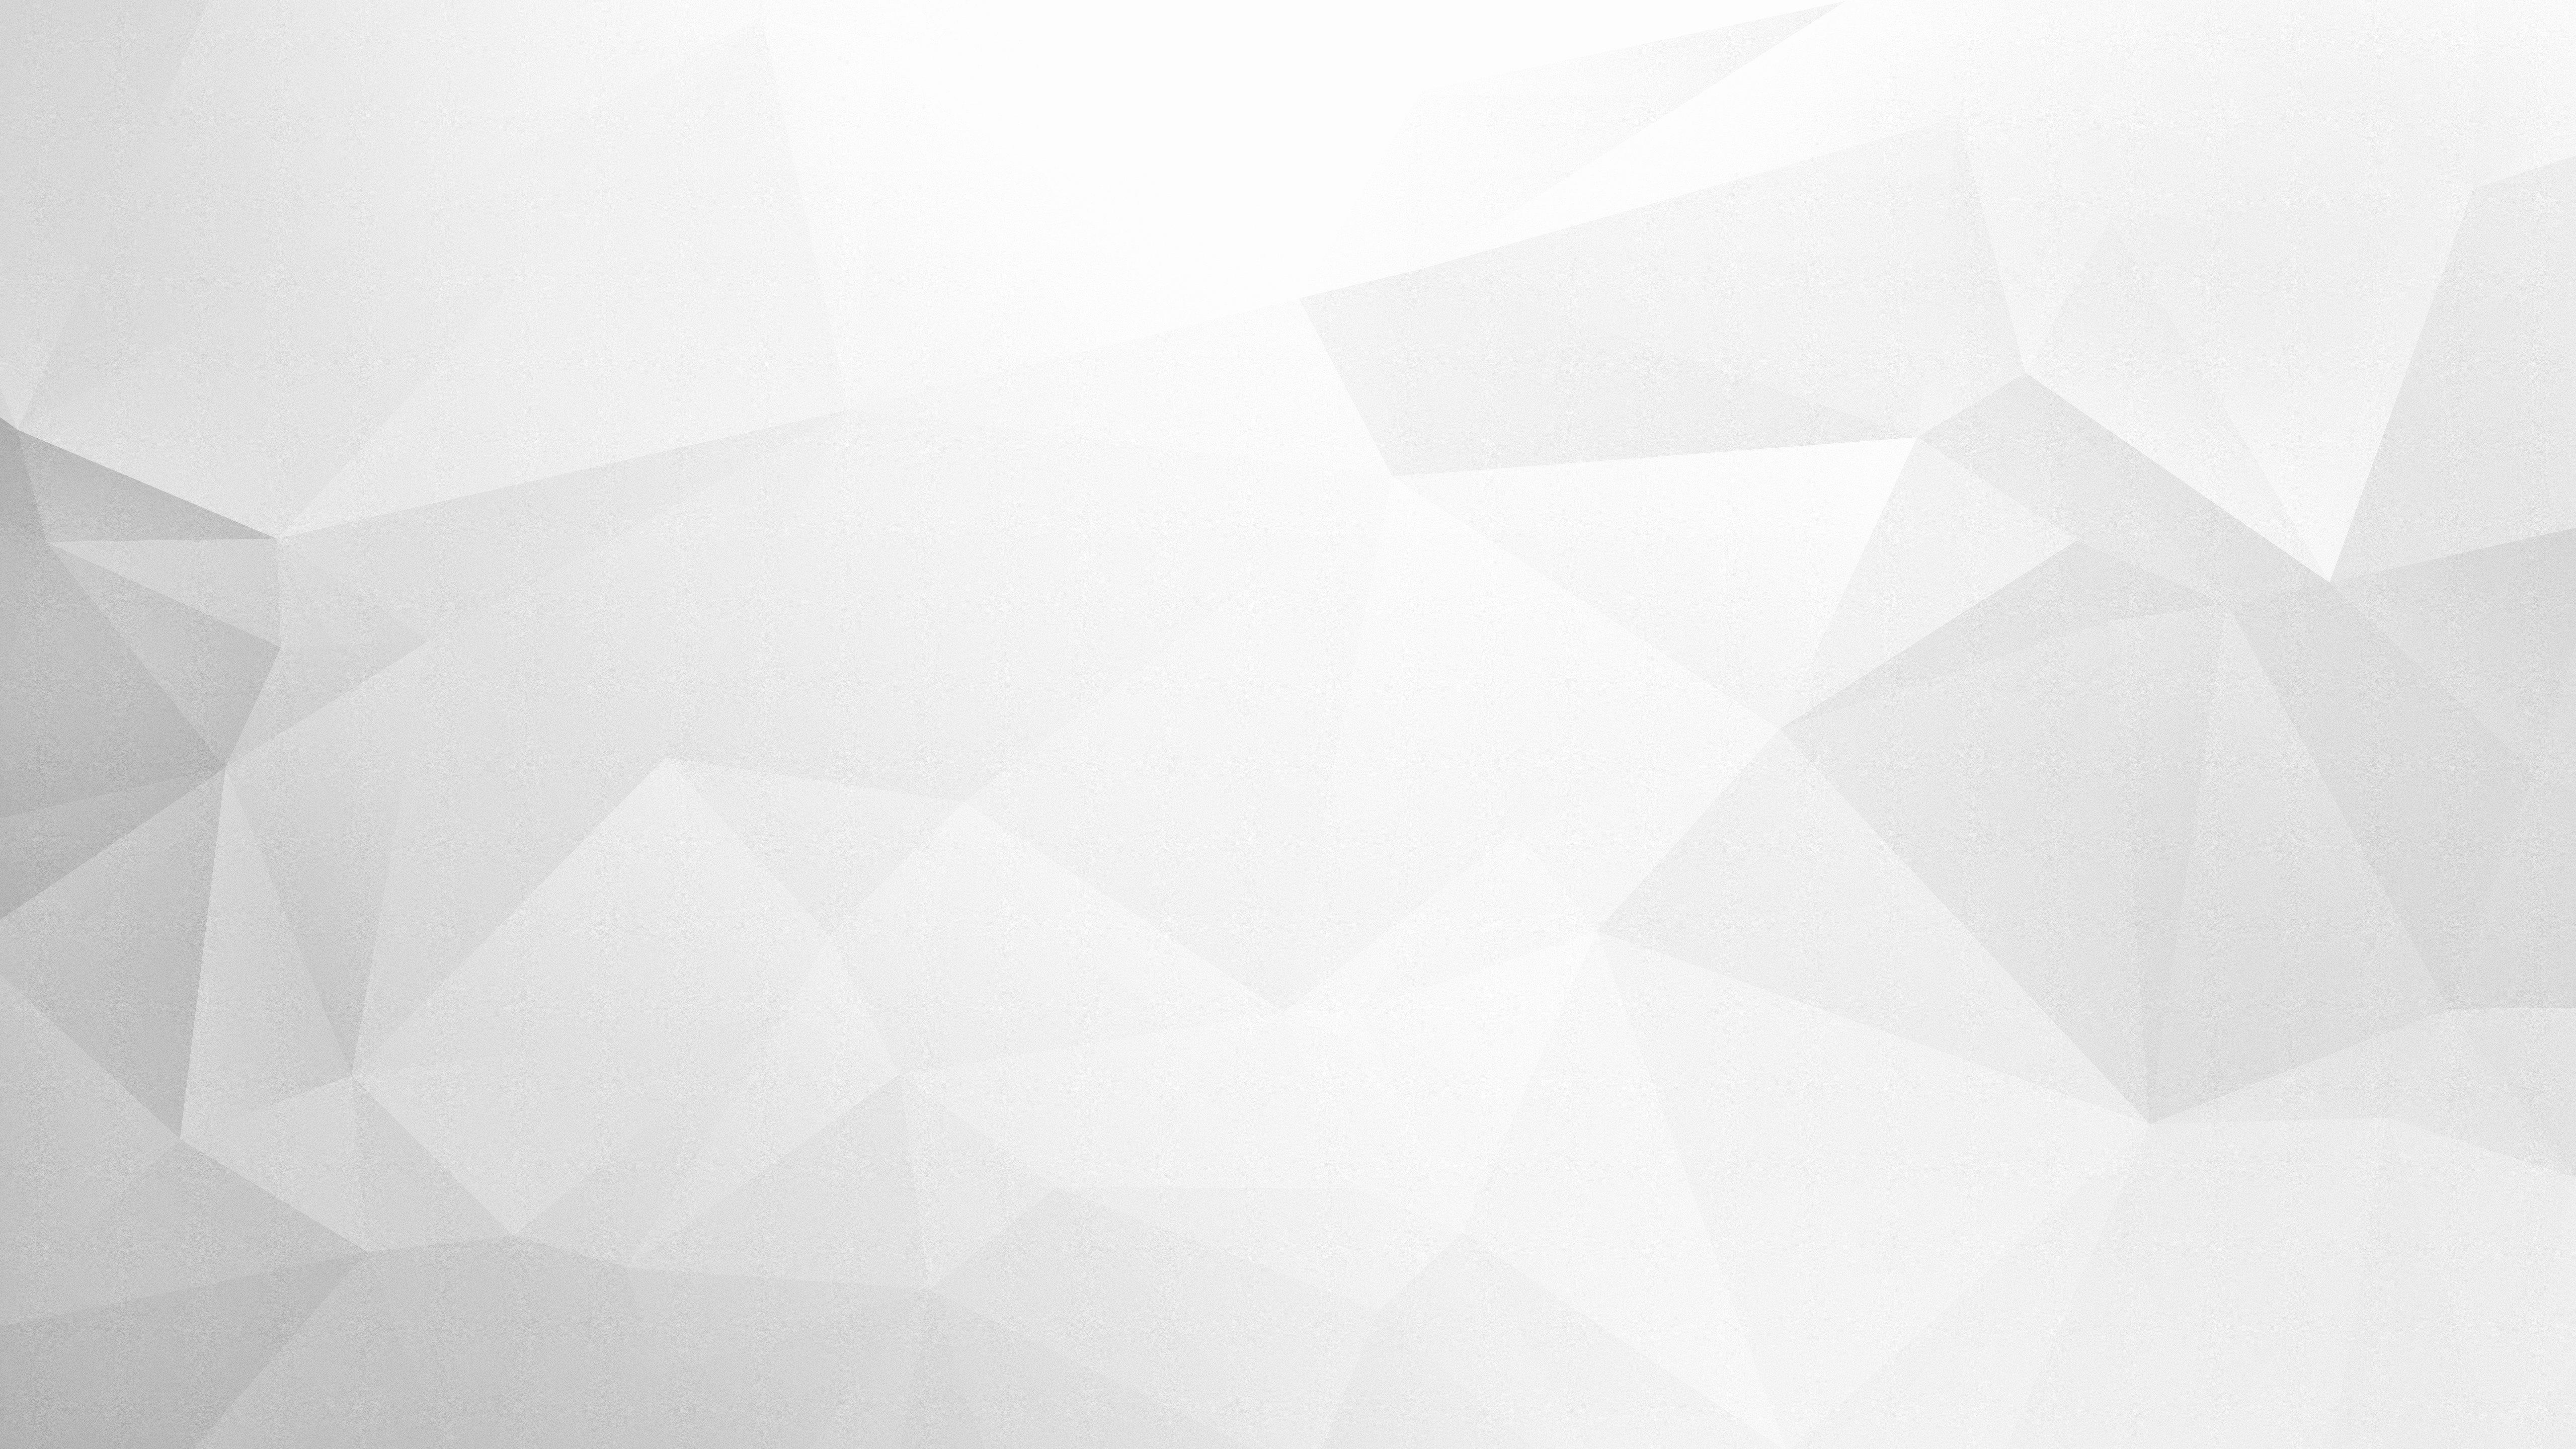 Email Template Background Image Beautiful White Background 9b1 Imlaak